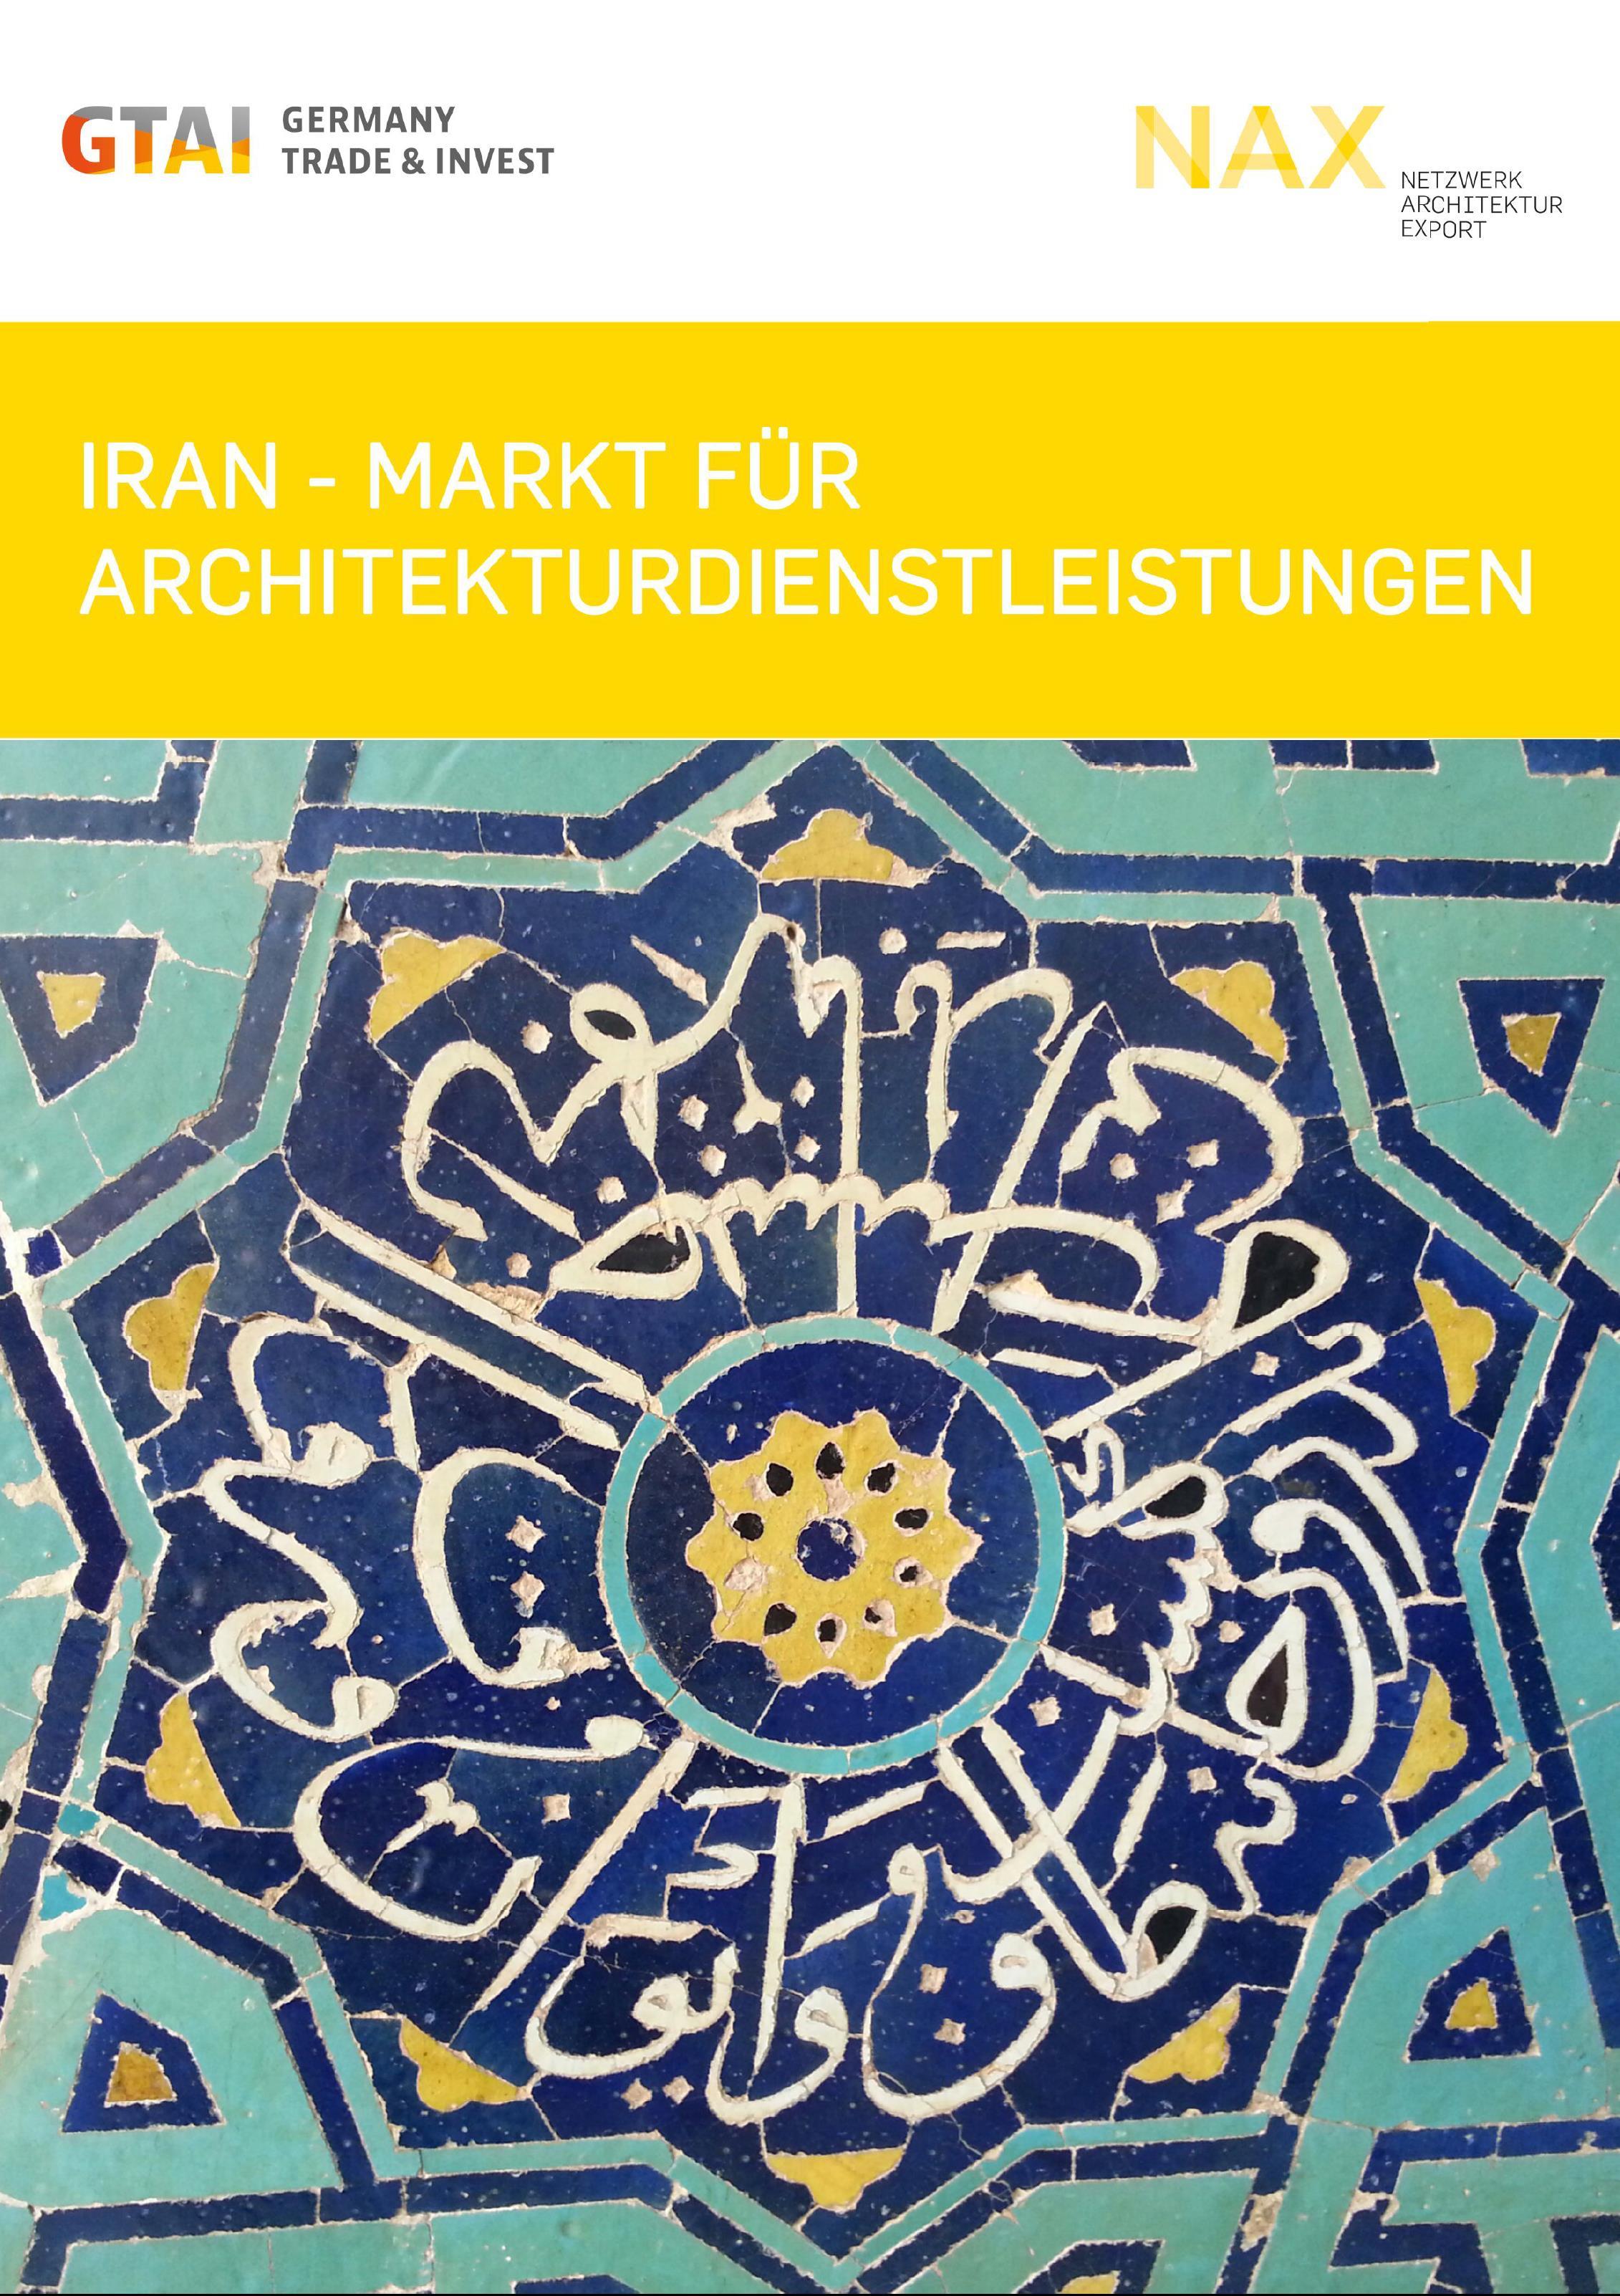 nax-report-01-17-Wirtschaft-GTAI-Broschüre